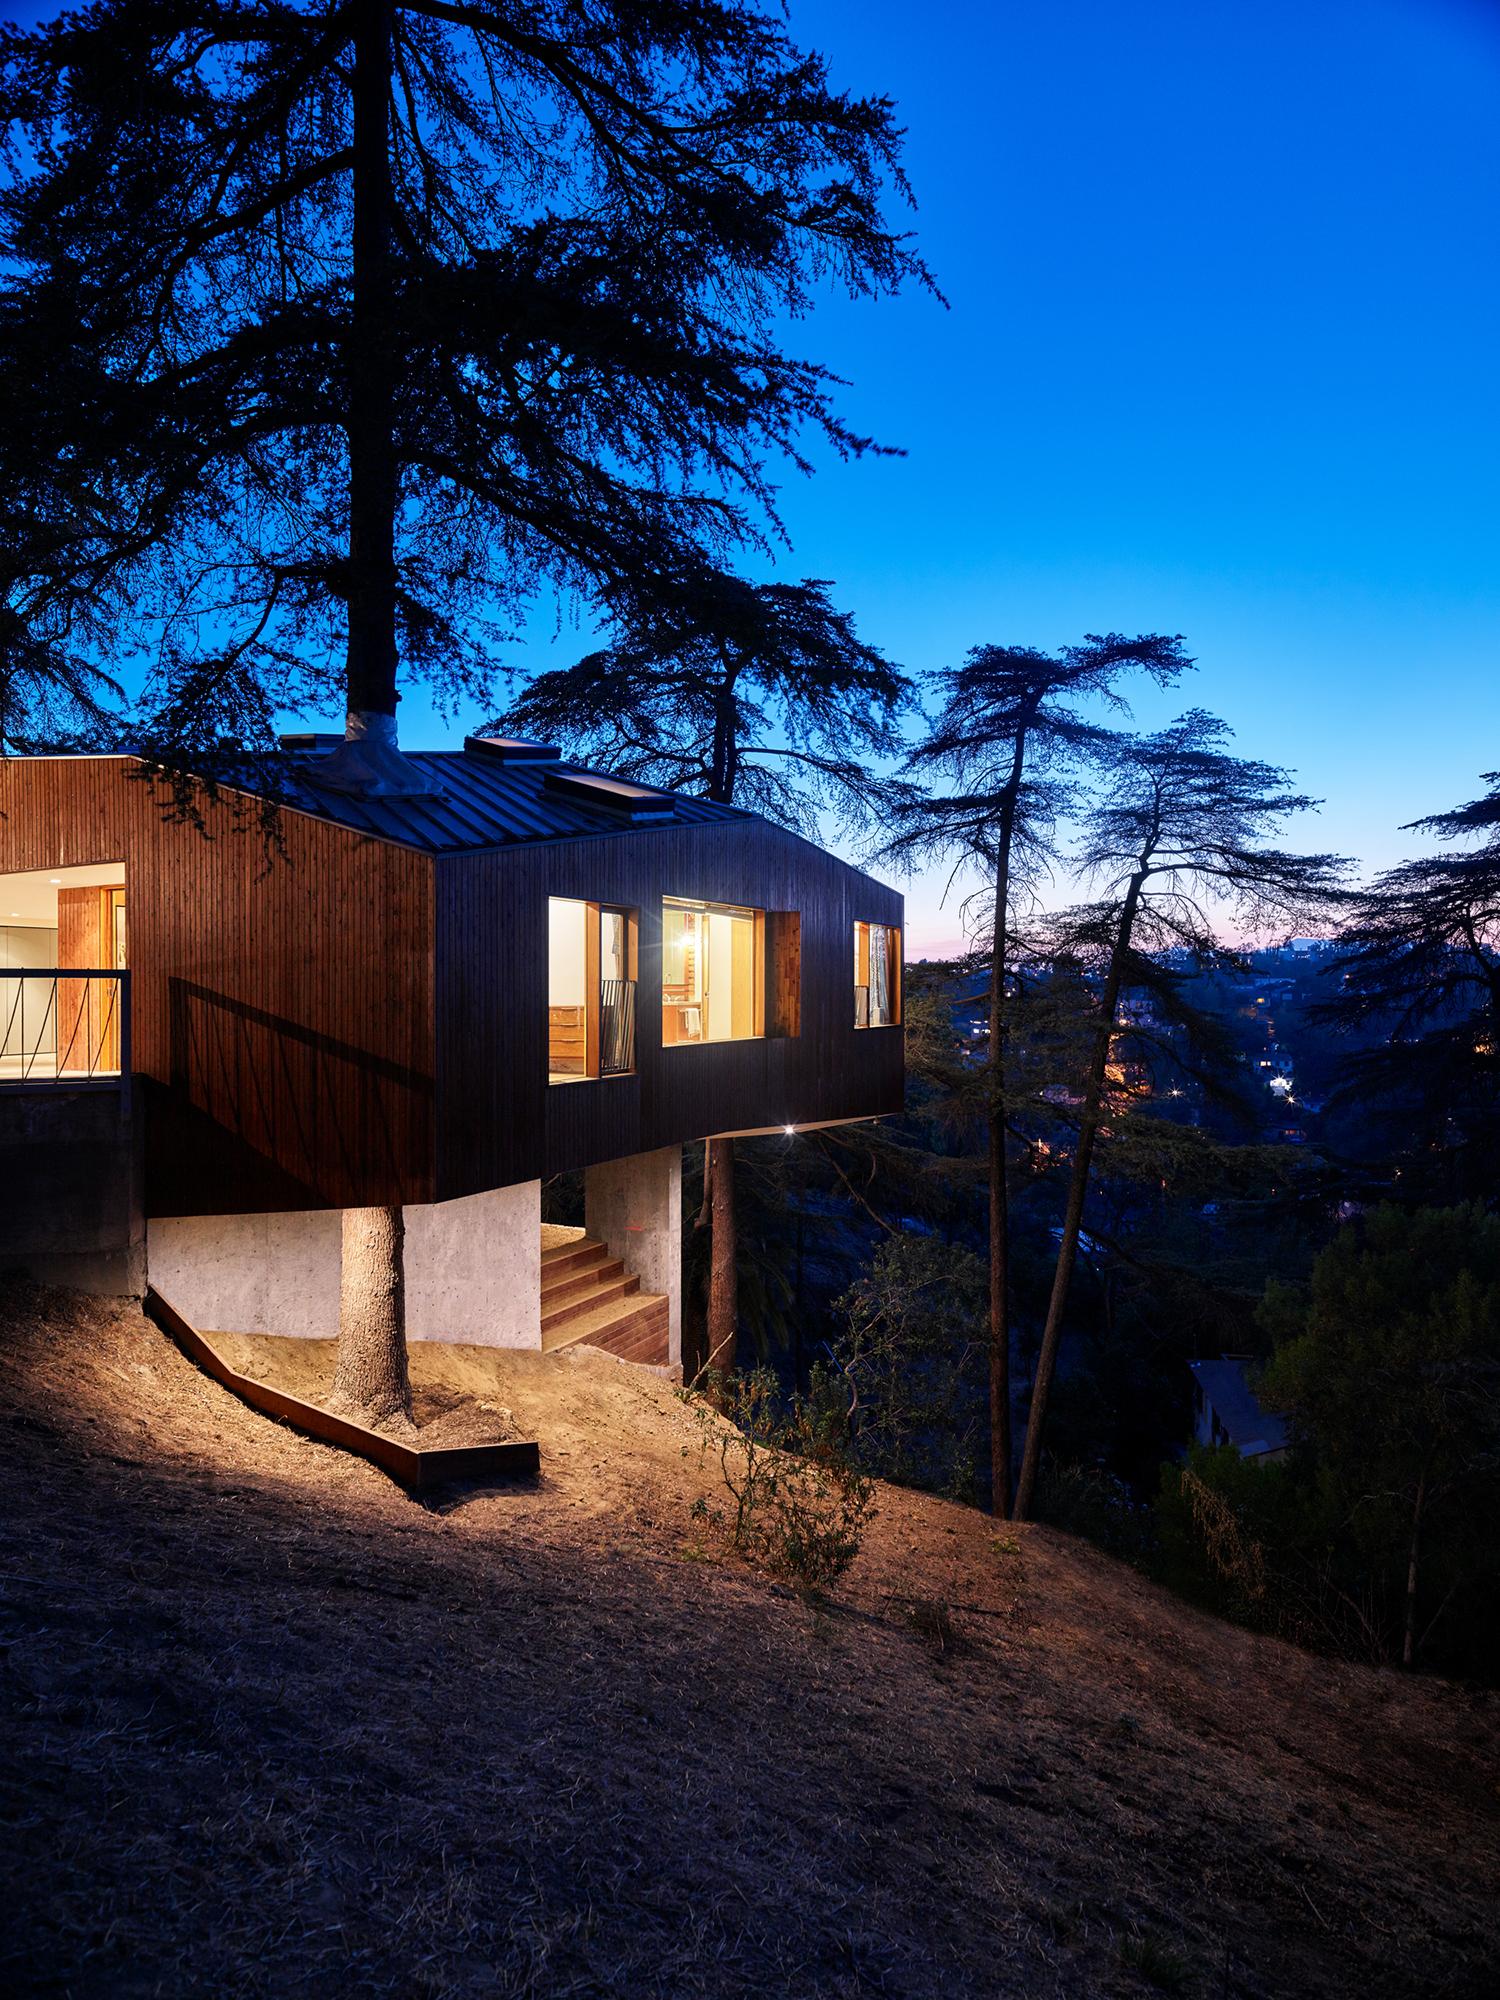 Simon Storey House, Los Angeles, California, 2016